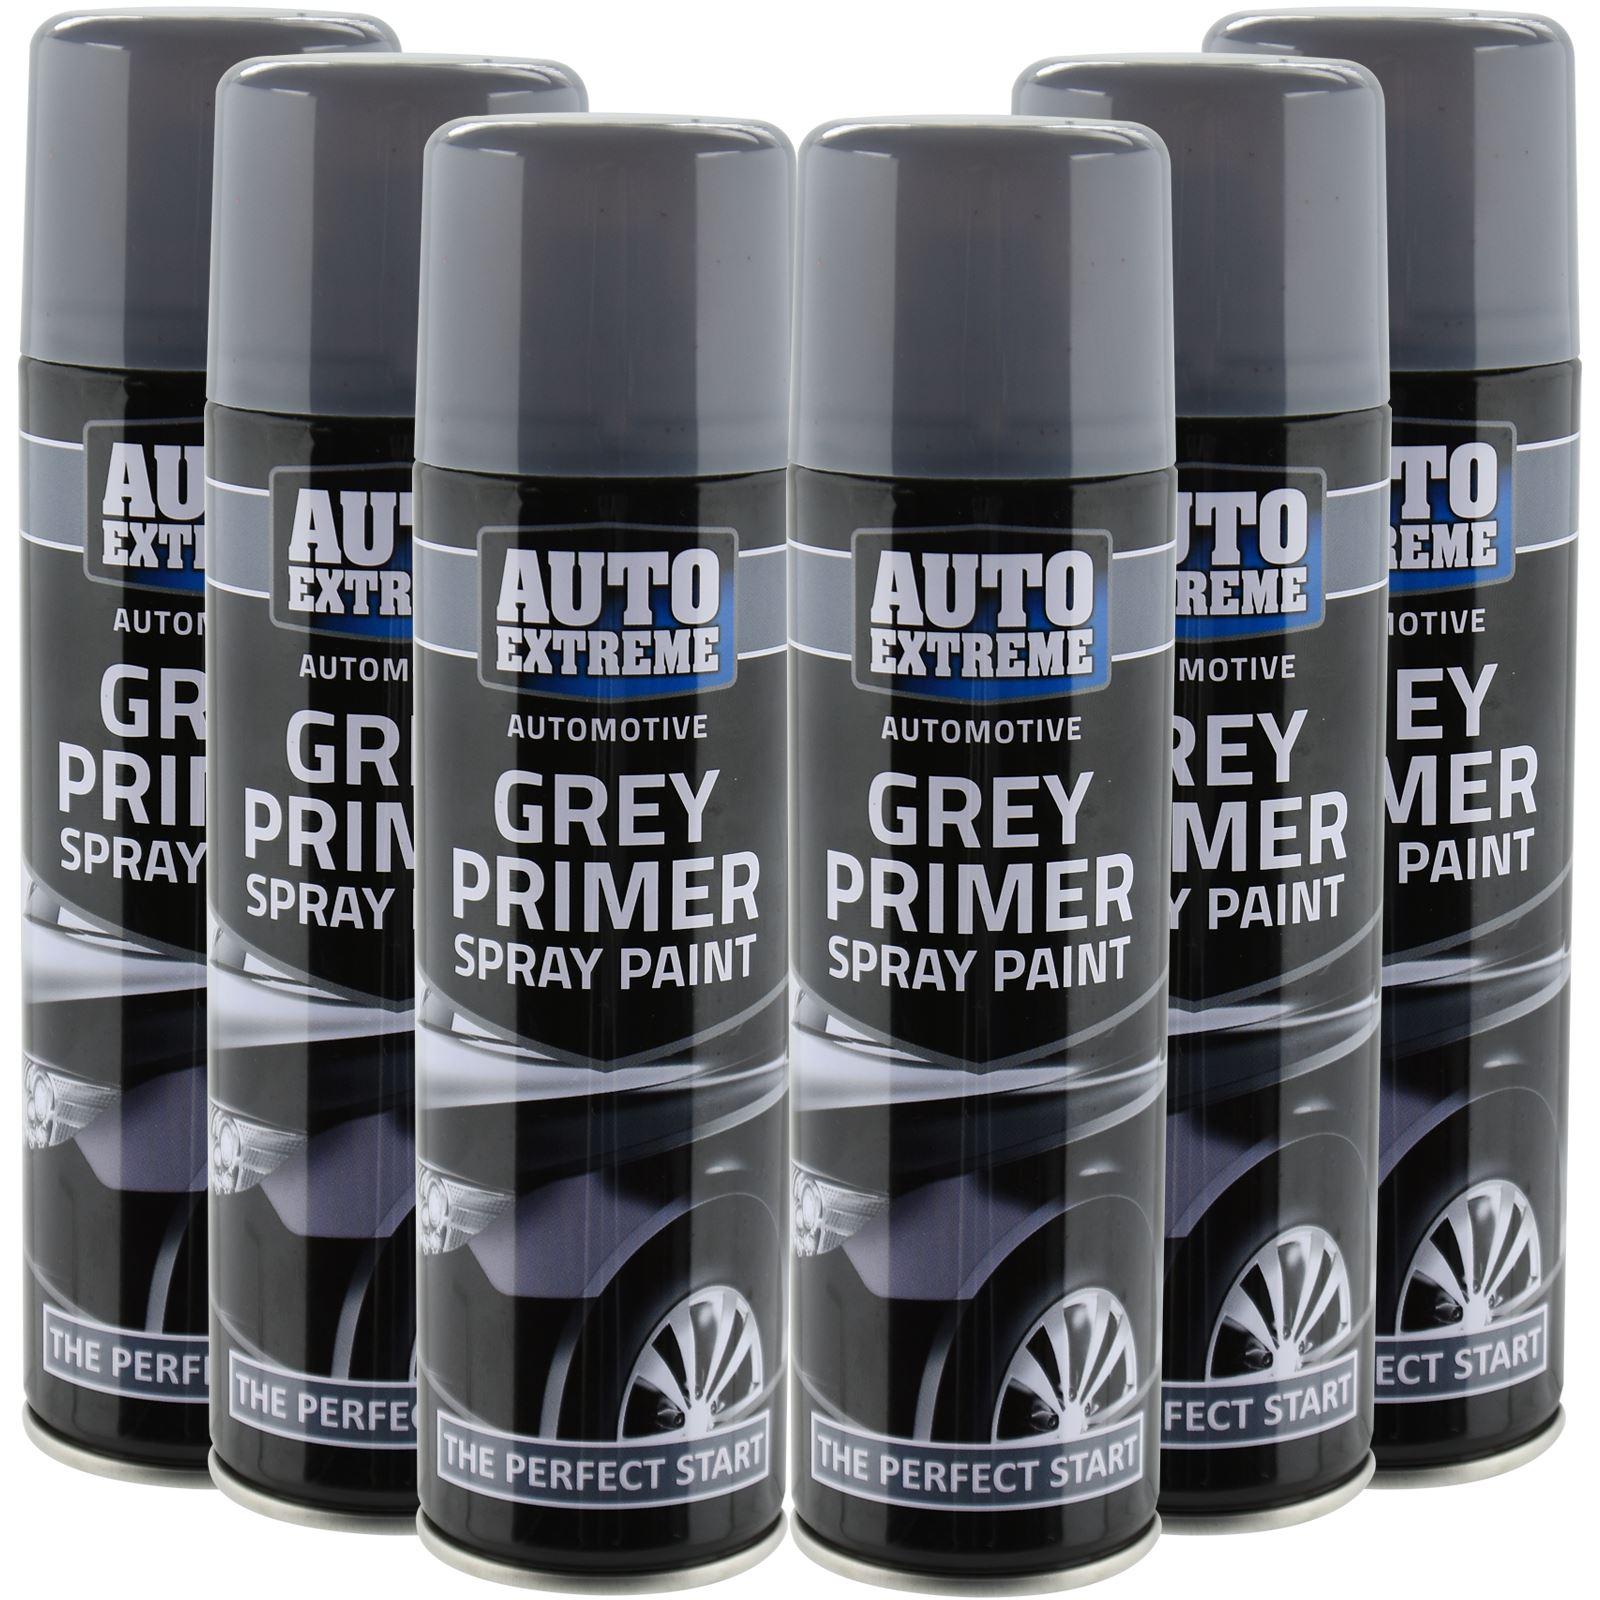 Automotive Grey Primer Spray Paint 250ml Aersol Fast Dry Metal Interior Exterior Ebay